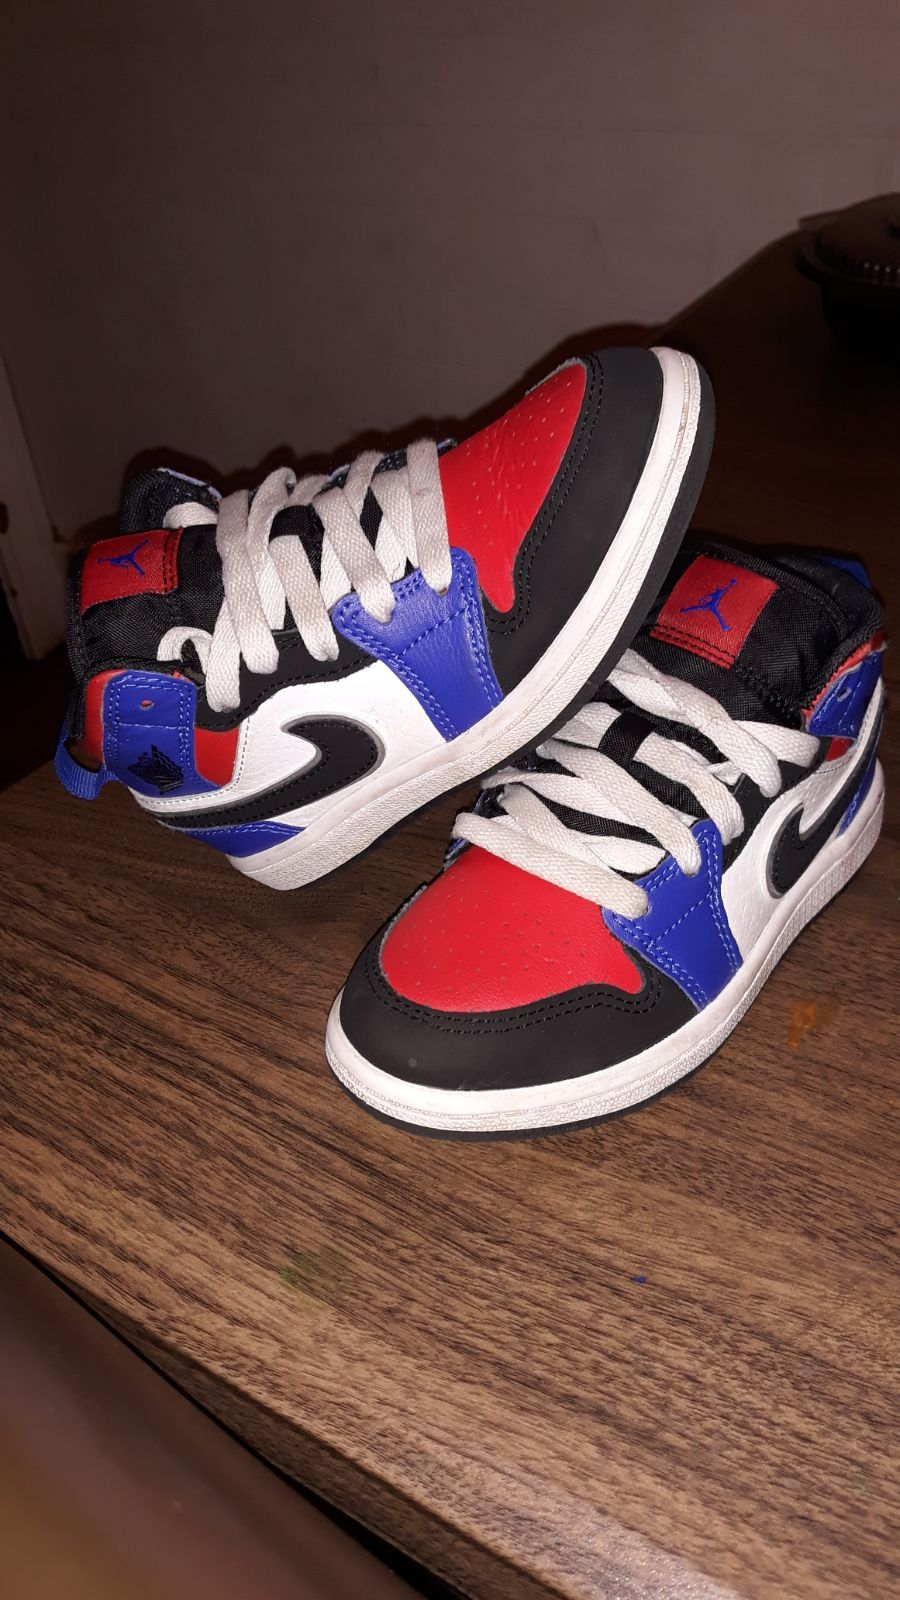 Pin on Air Jordan Shoes